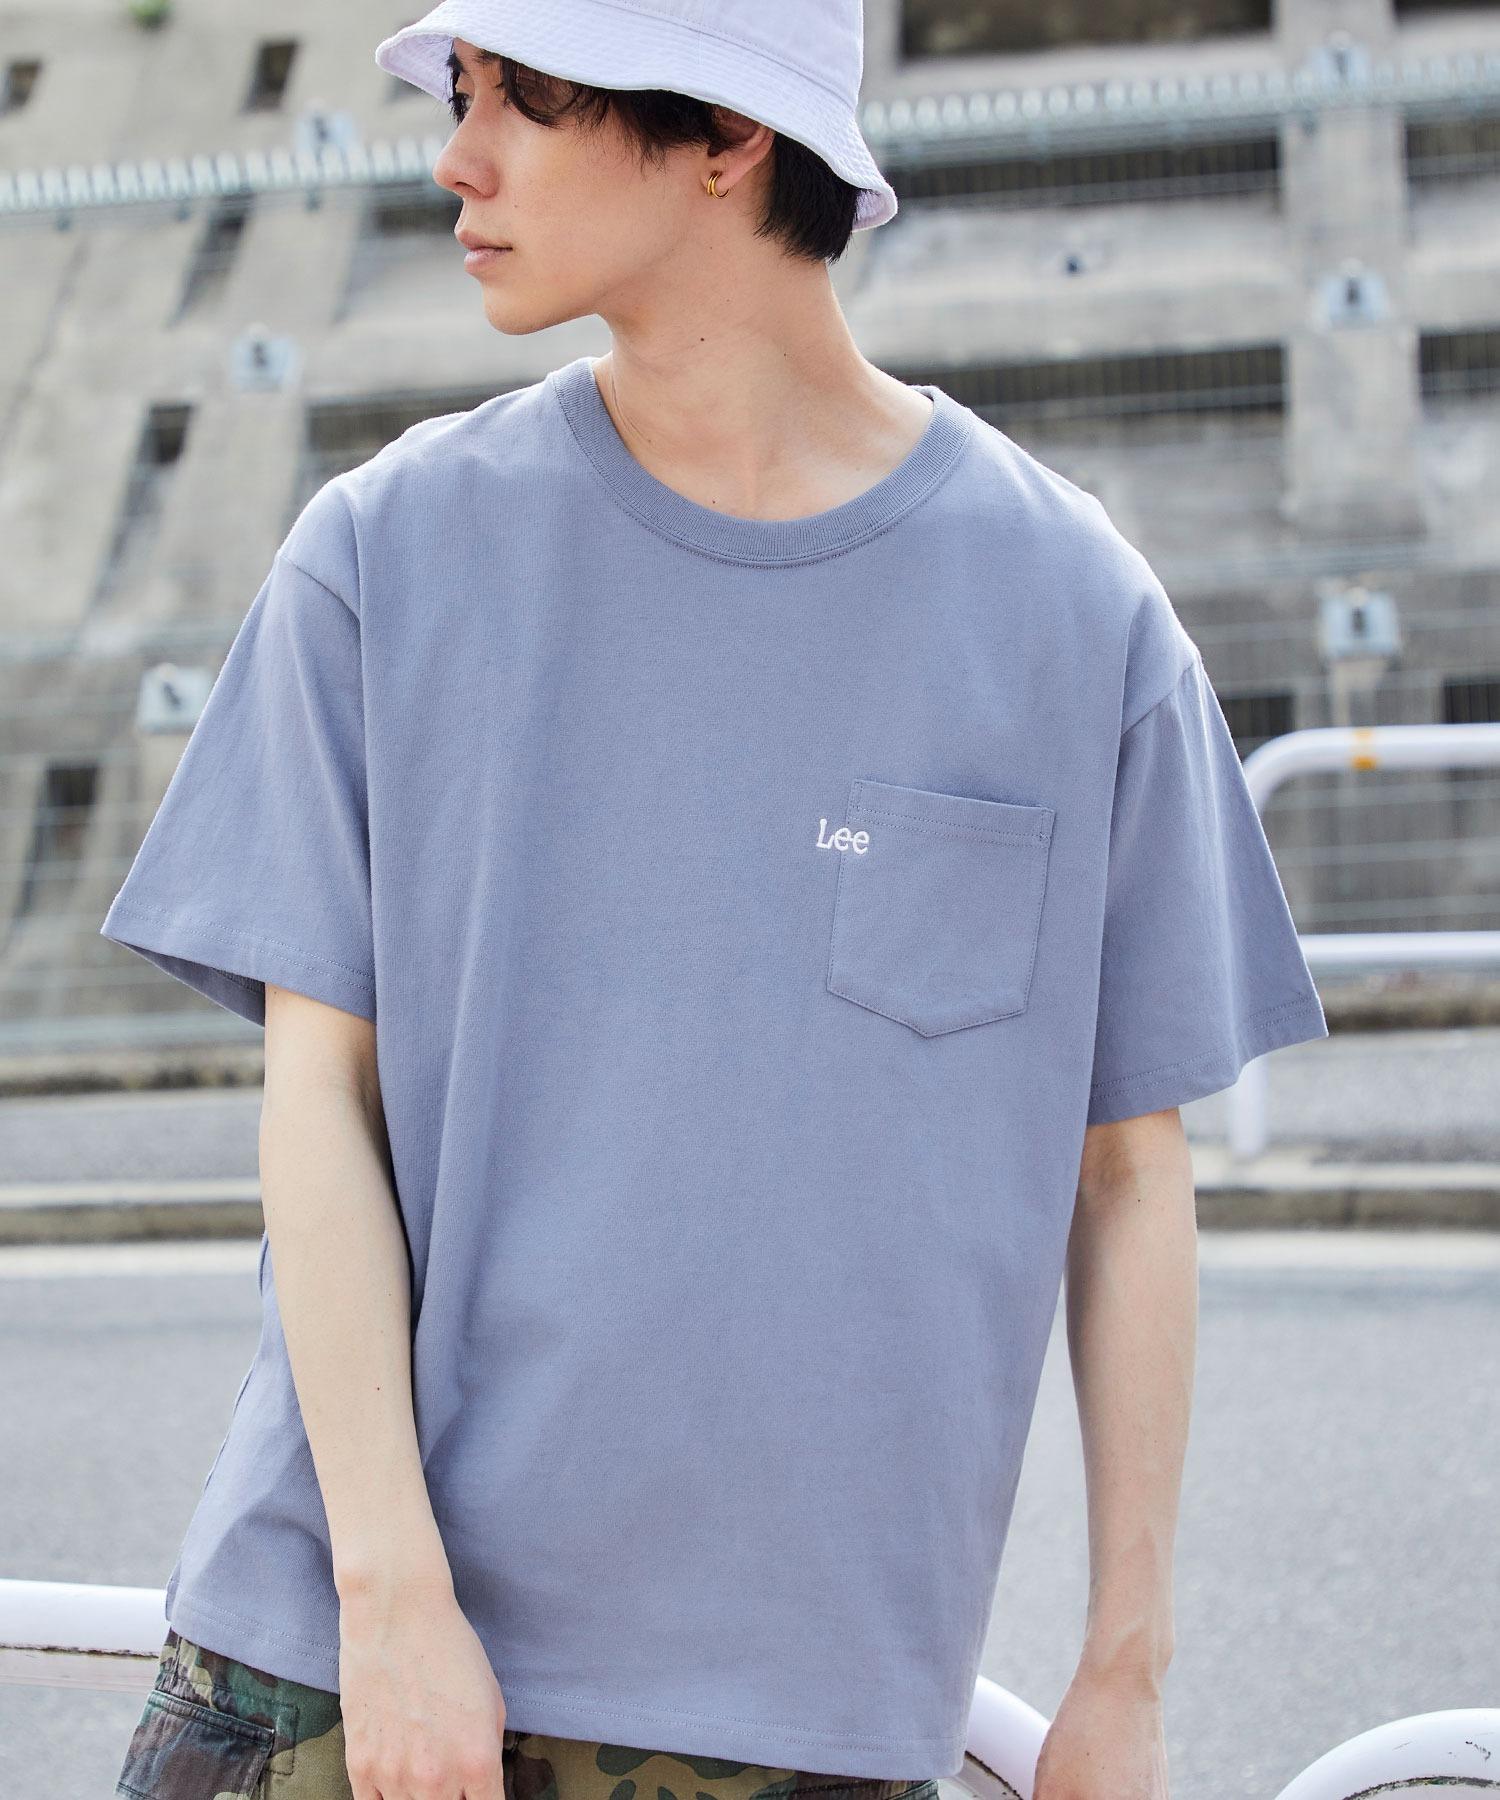 Lee/リー LOGO POCKET S/S TEE ロゴ刺繍ポケット半袖Tシャツ